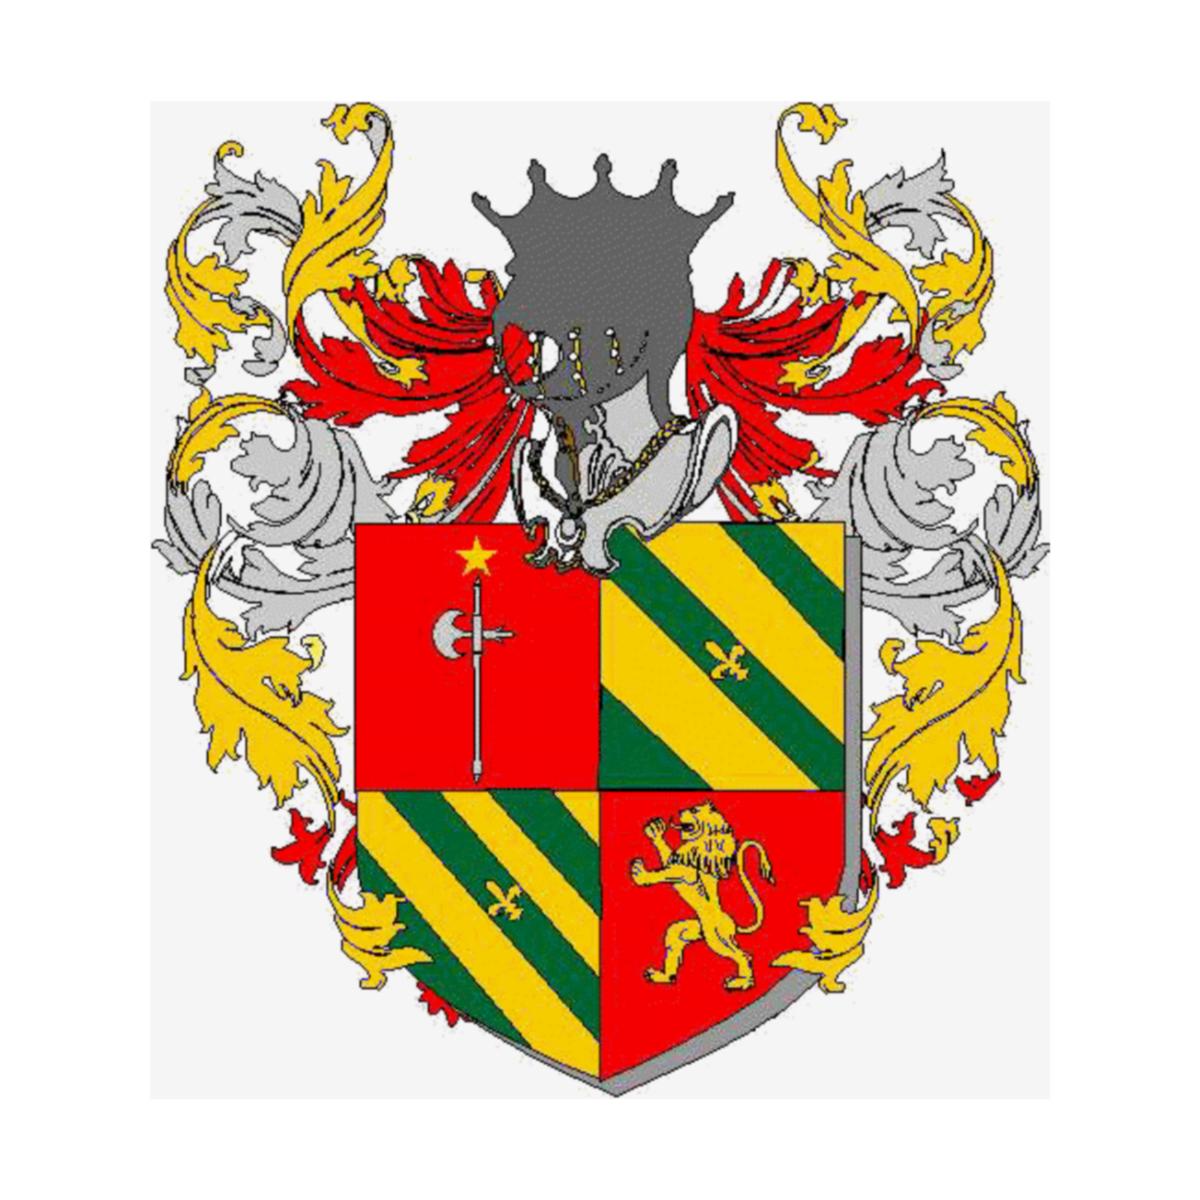 Segrè Sartorio Escudo de armas, Origen Apellido, Heráldica